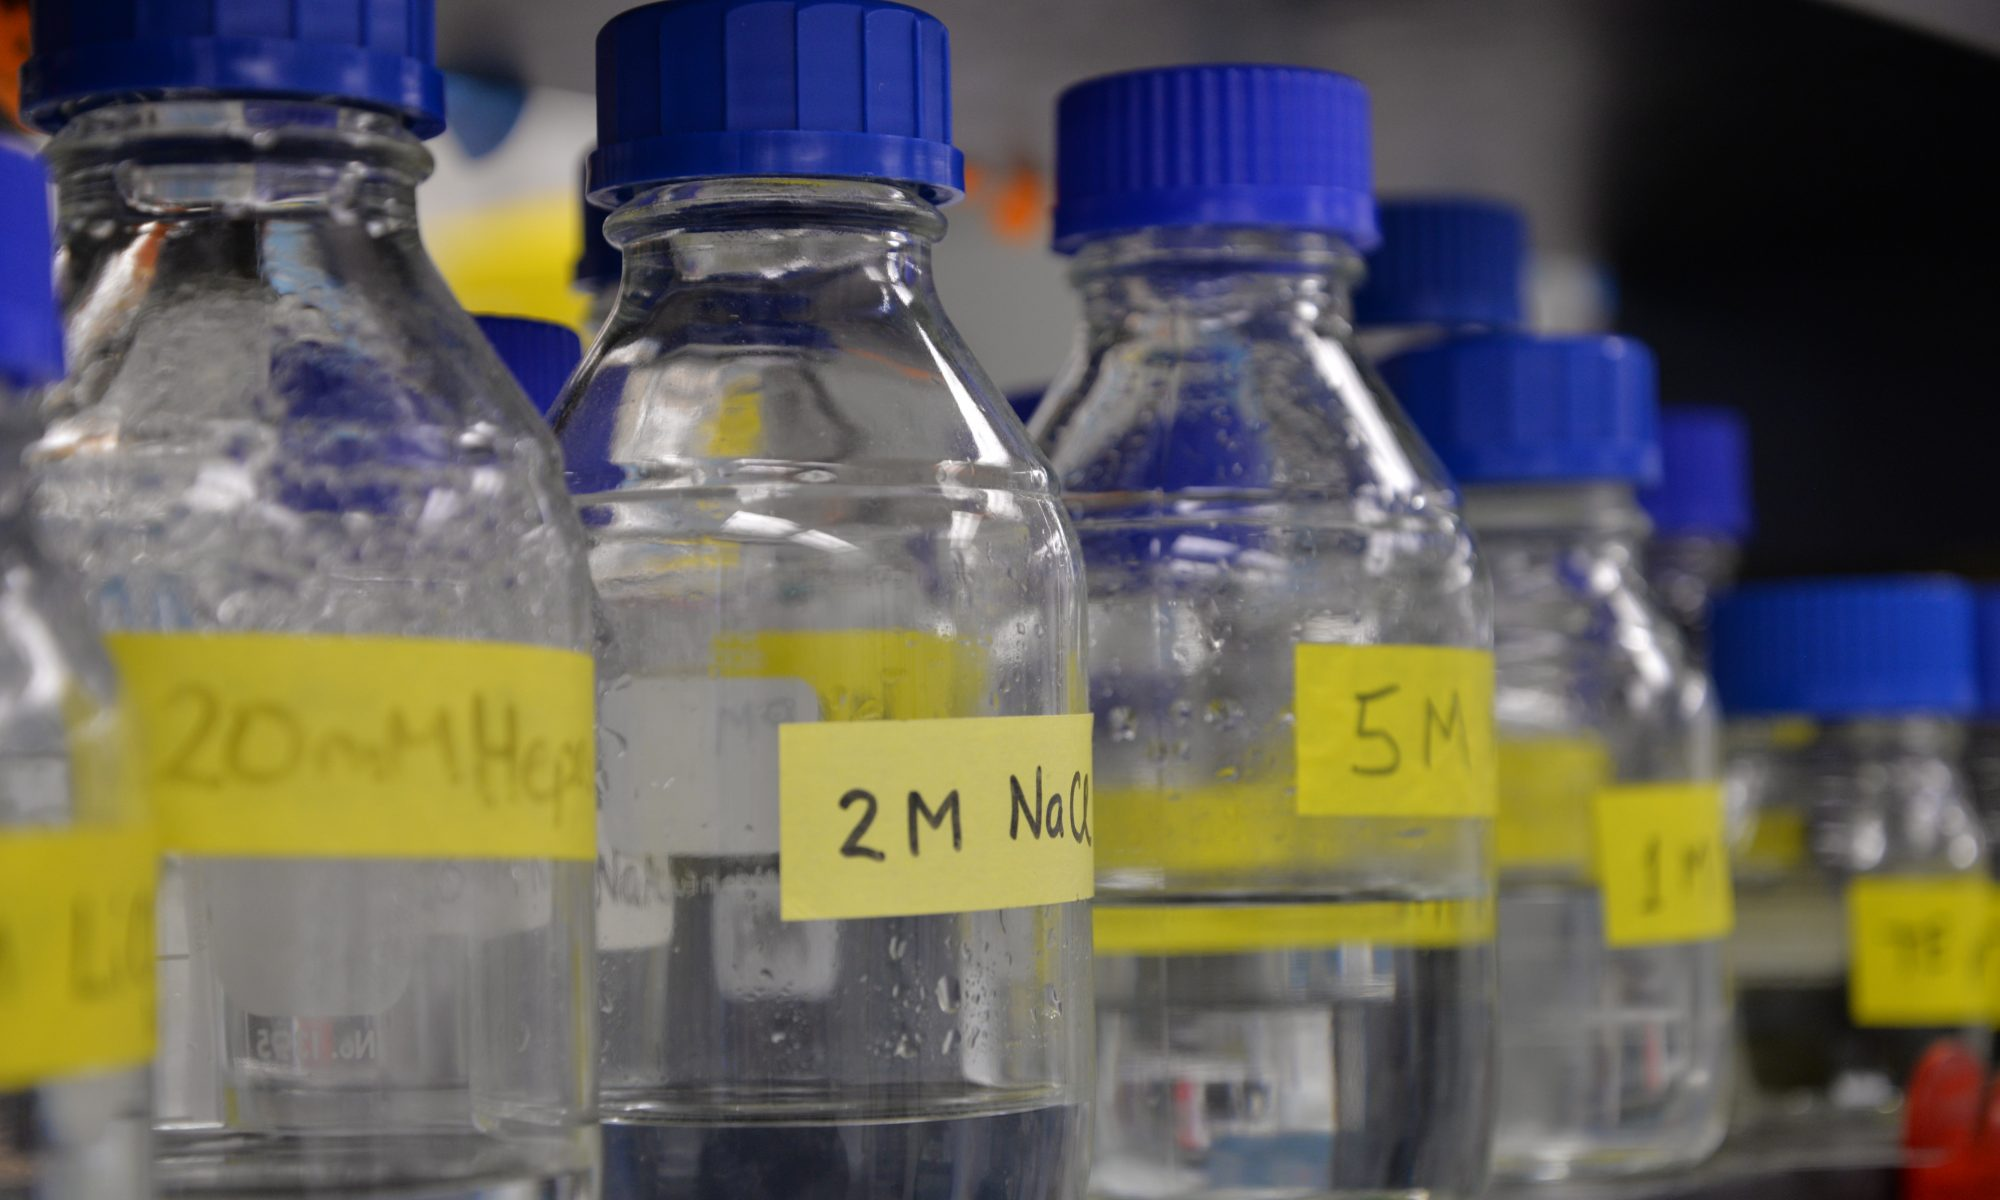 Marignani Discovery Research Laboratory